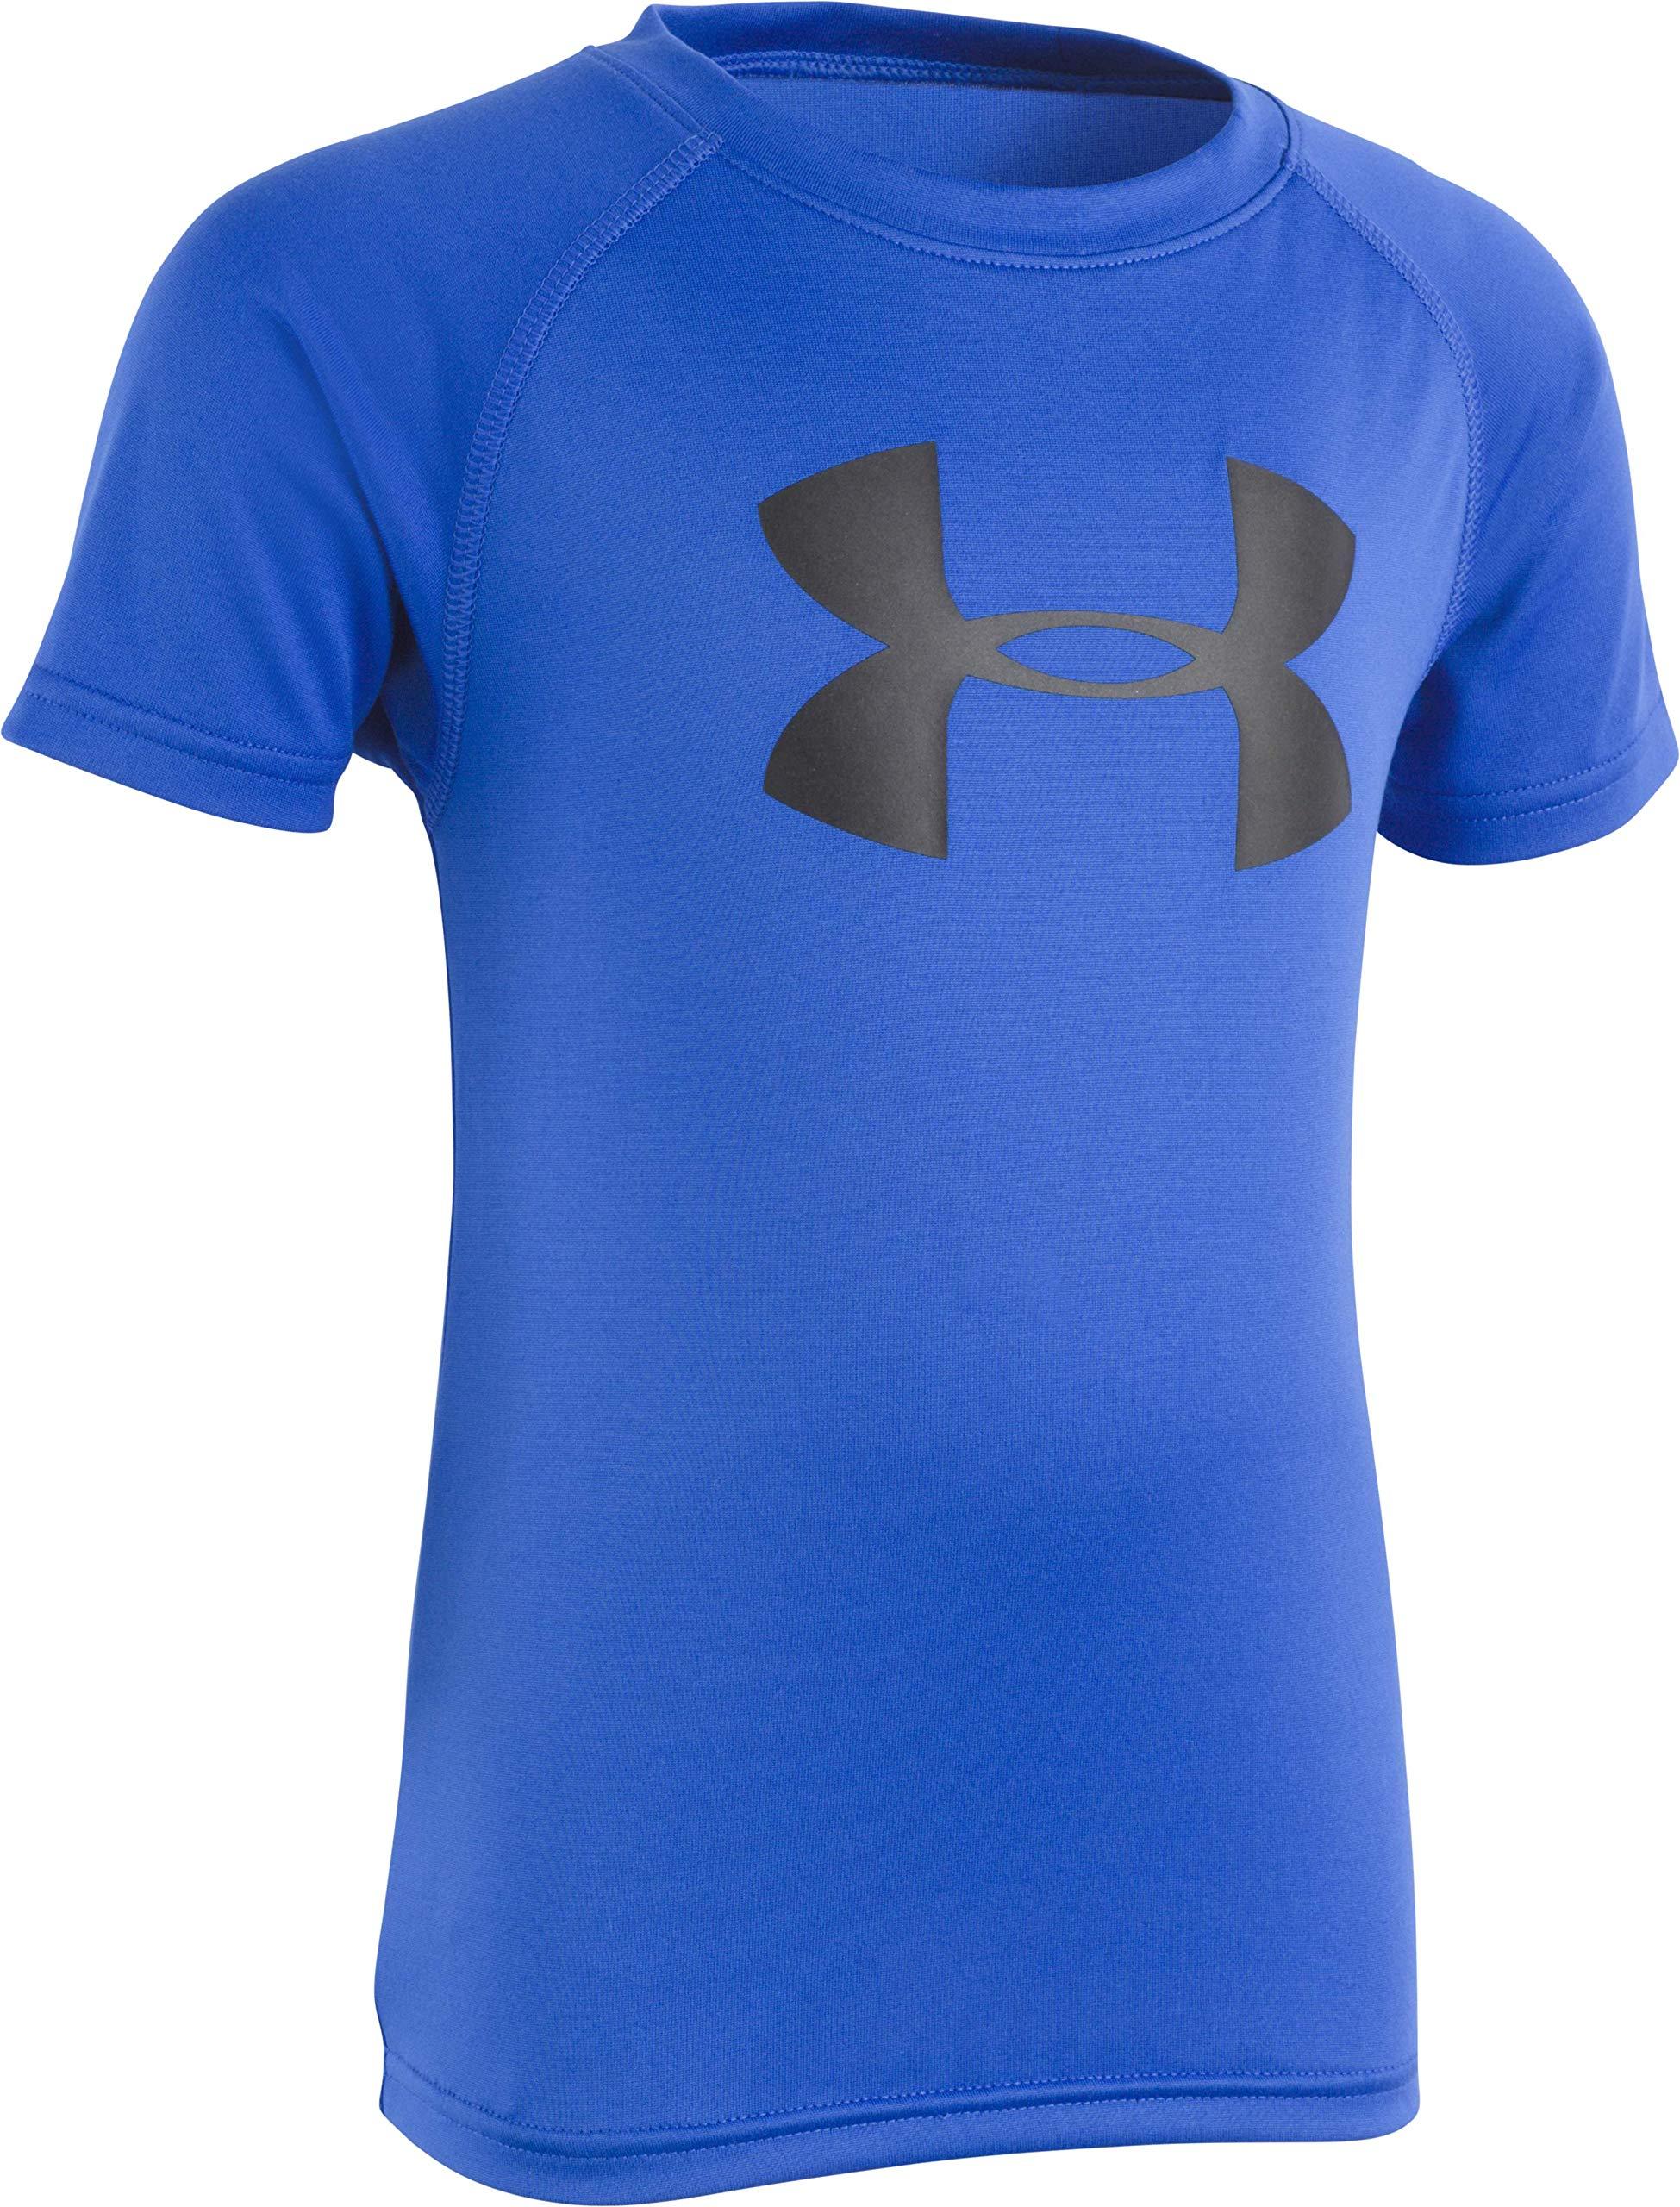 Under Armour Boys' Toddler Big Logo Short Sleeve Tee Shirt, Ultra Blue, 4T by Under Armour